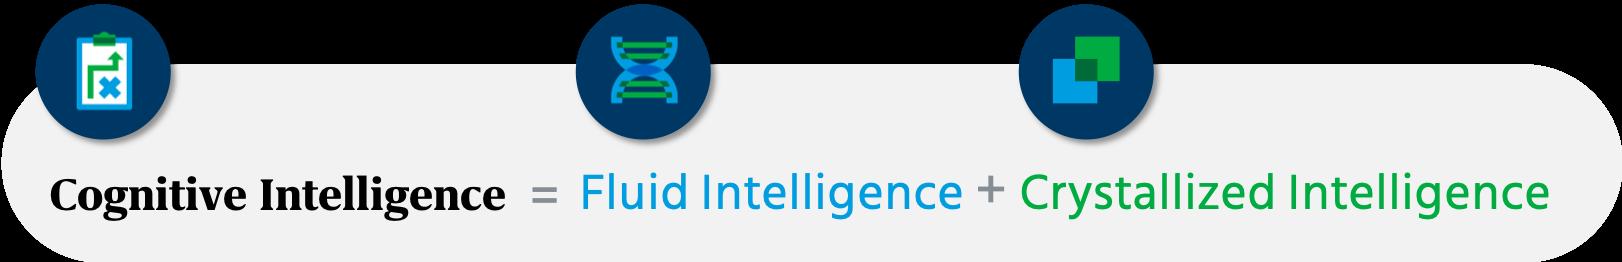 Aptitude test helps measure cognitive intelligence